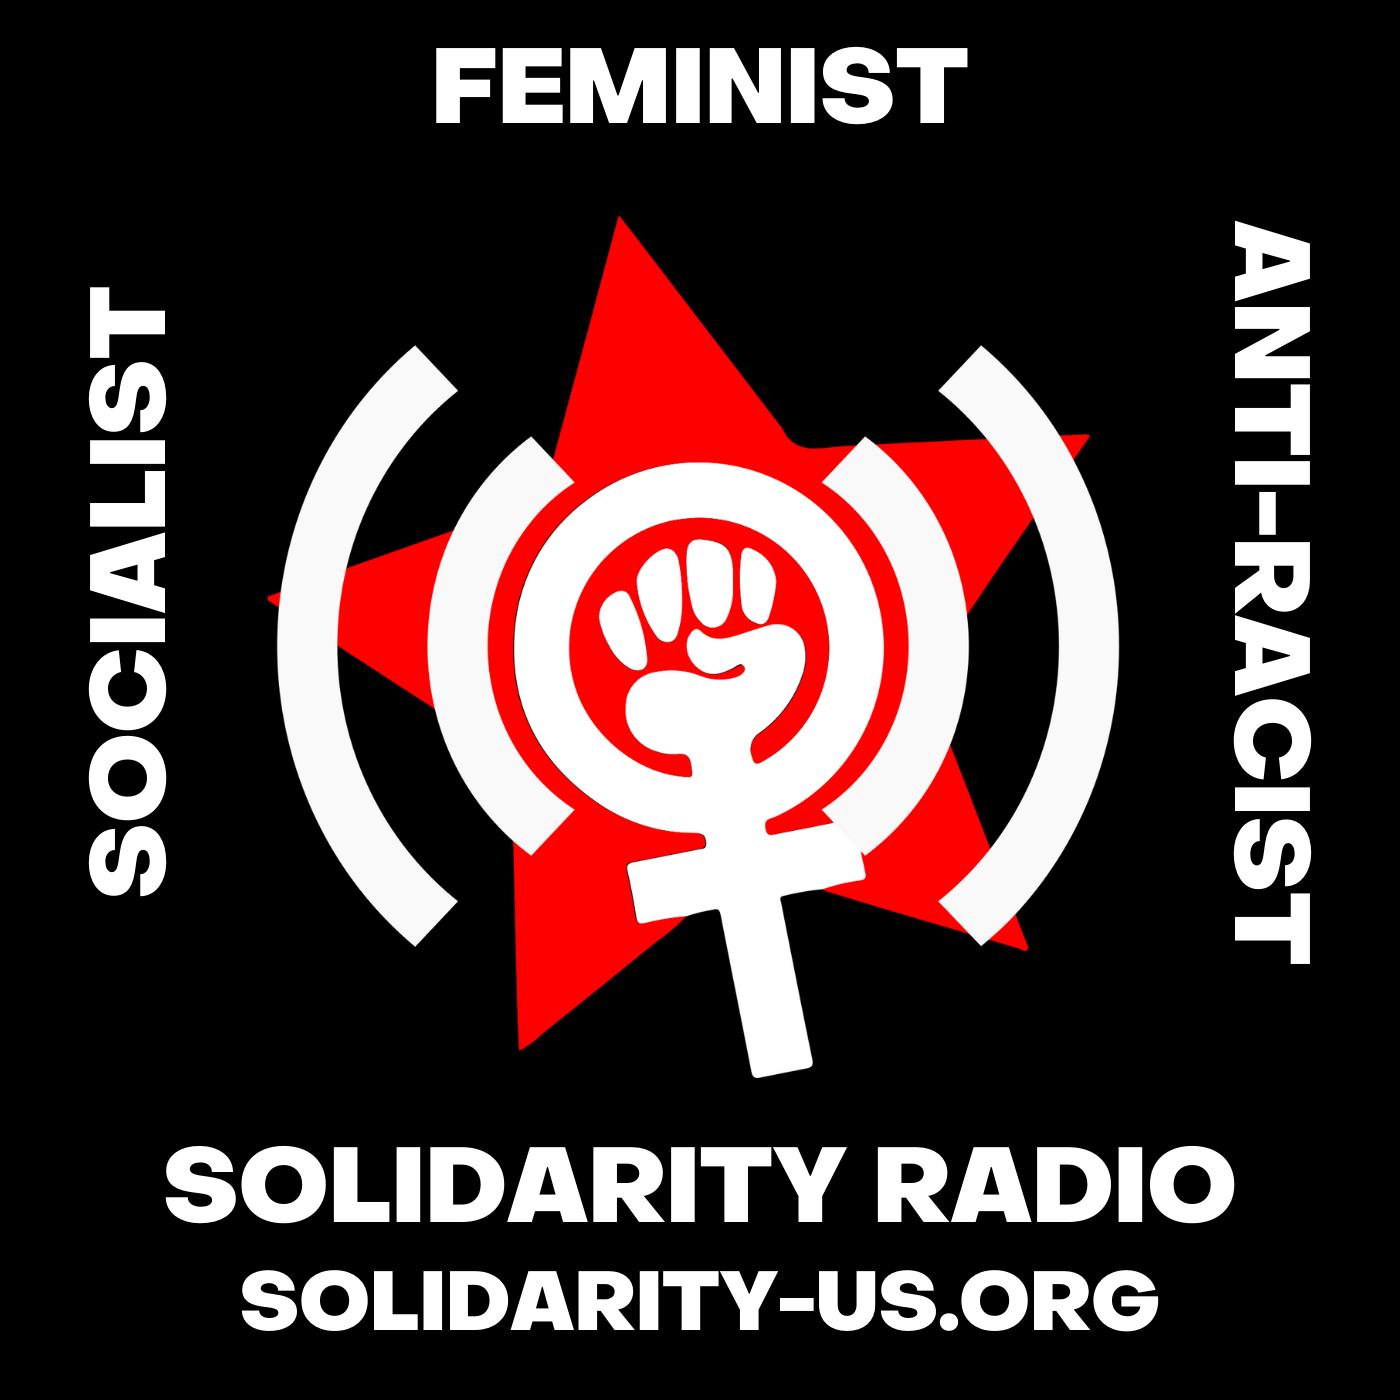 Solidarity Radio